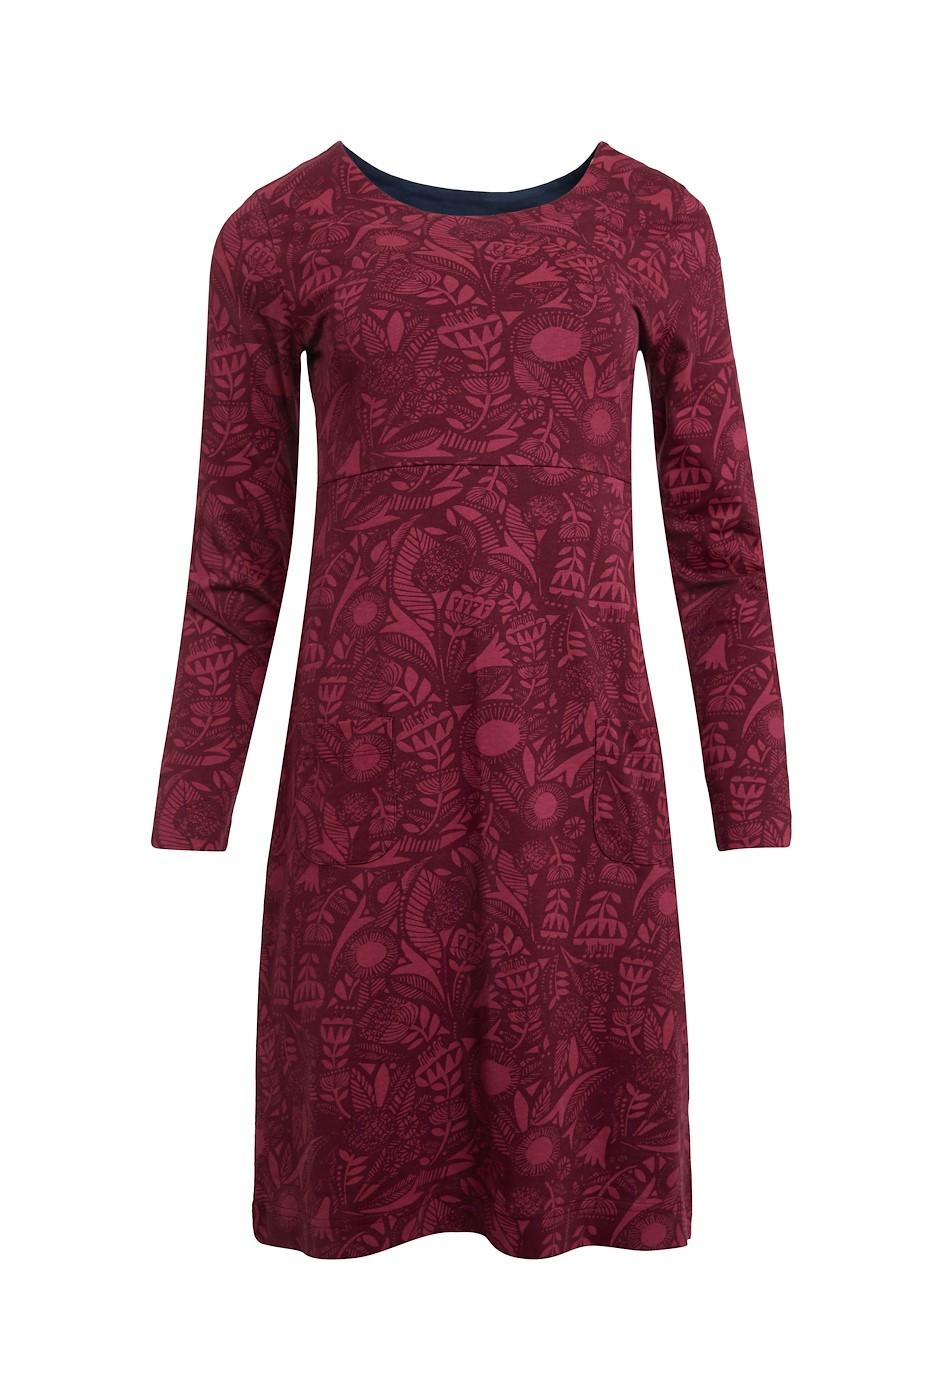 Delray Organic Cotton Jersey Dress Mulled Wine